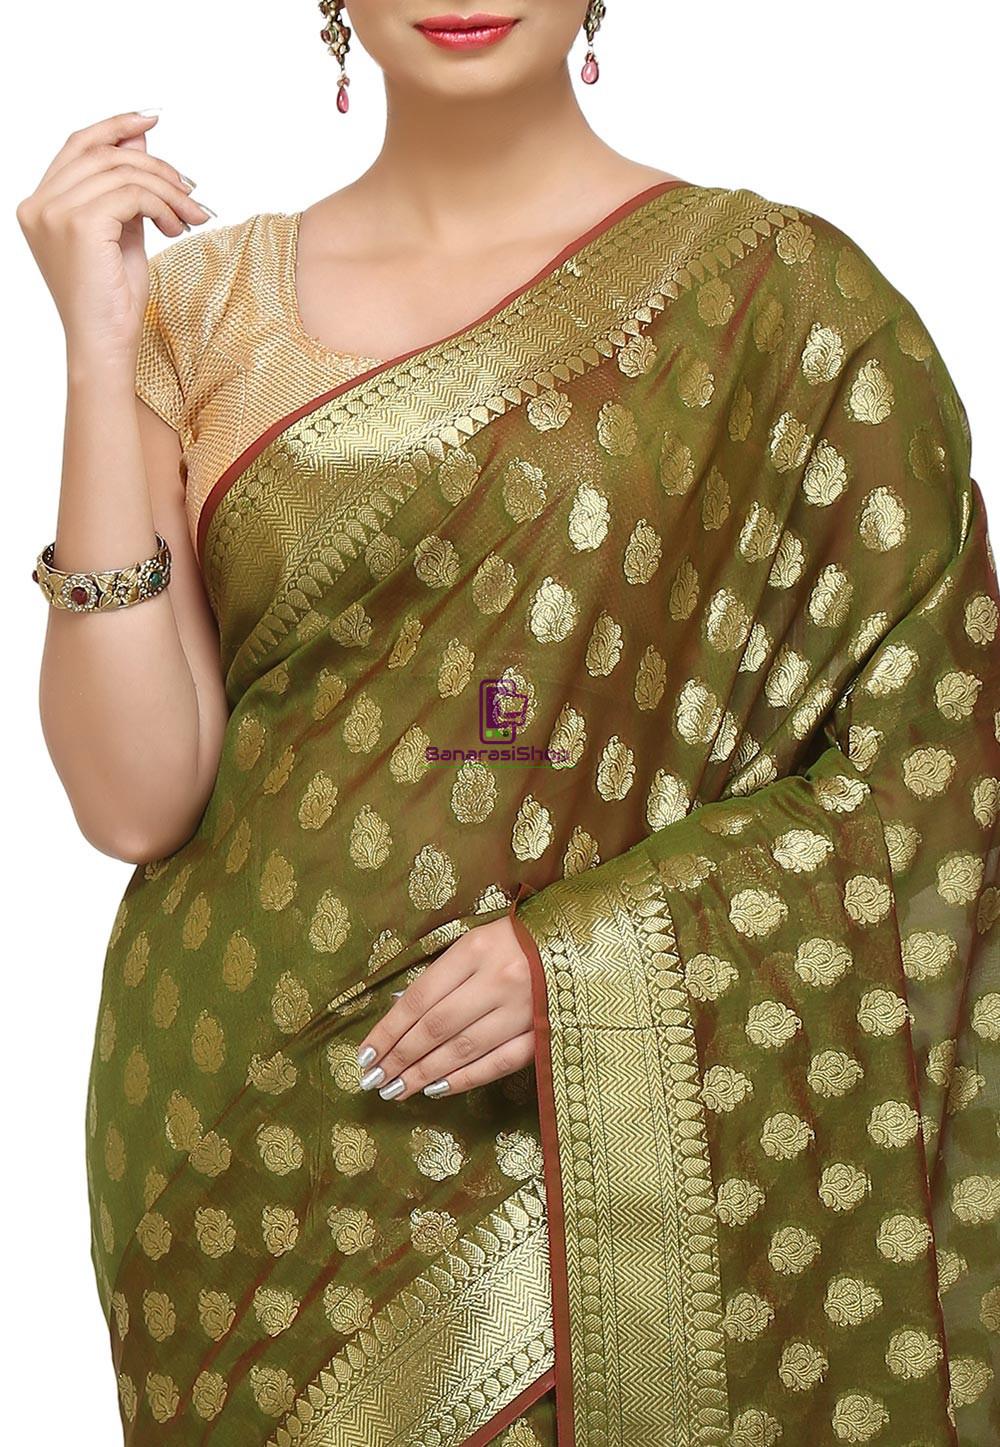 Banarasi Saree in Olive Green 2